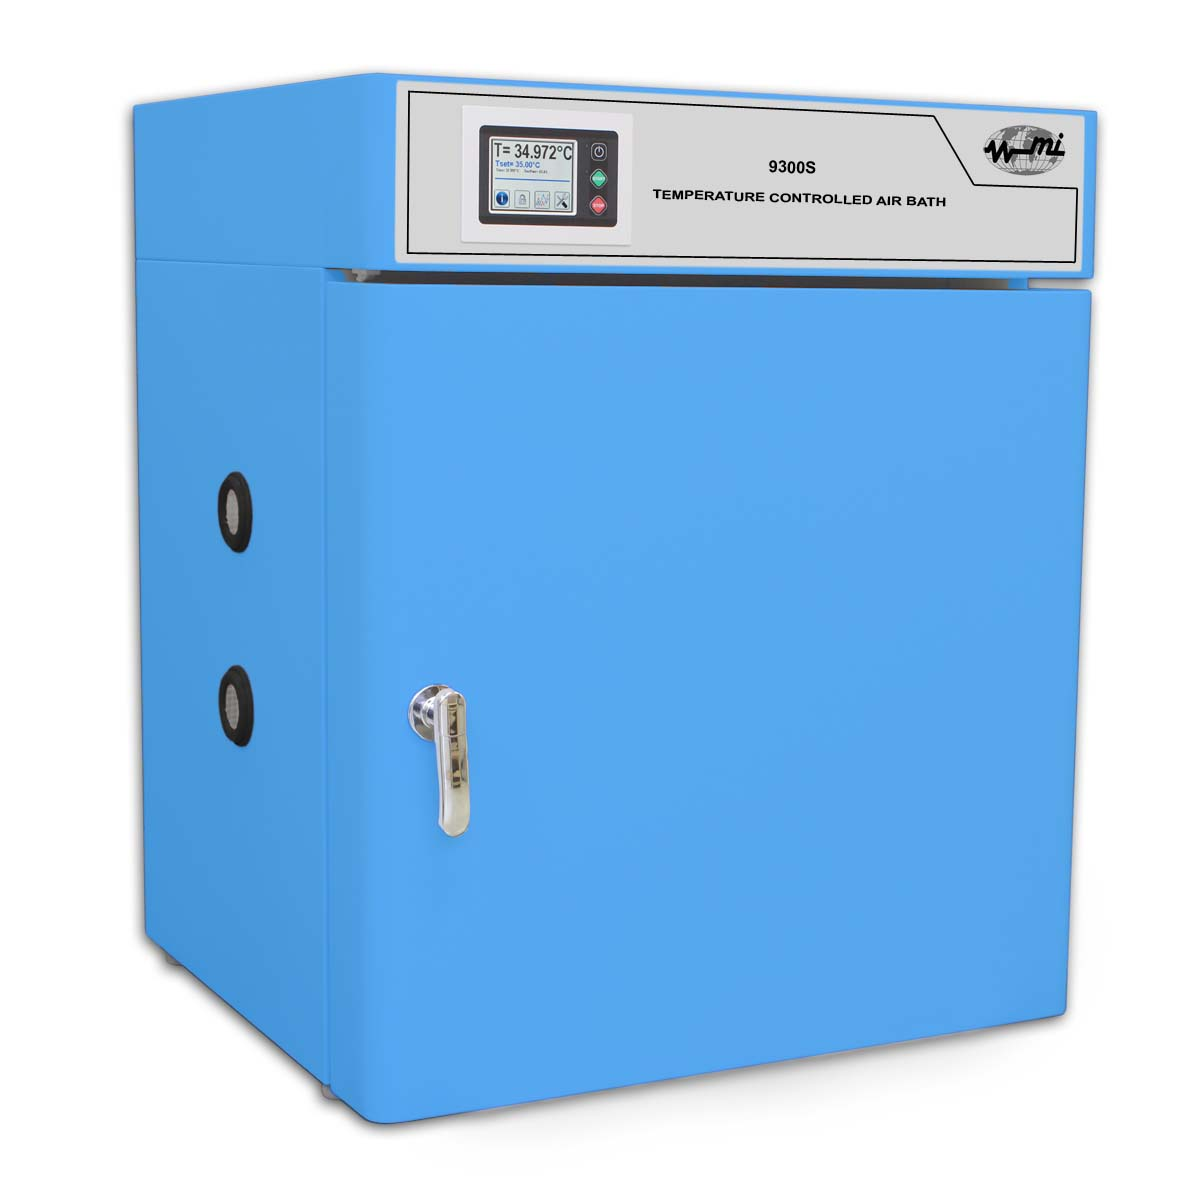 9300S - Measurements International